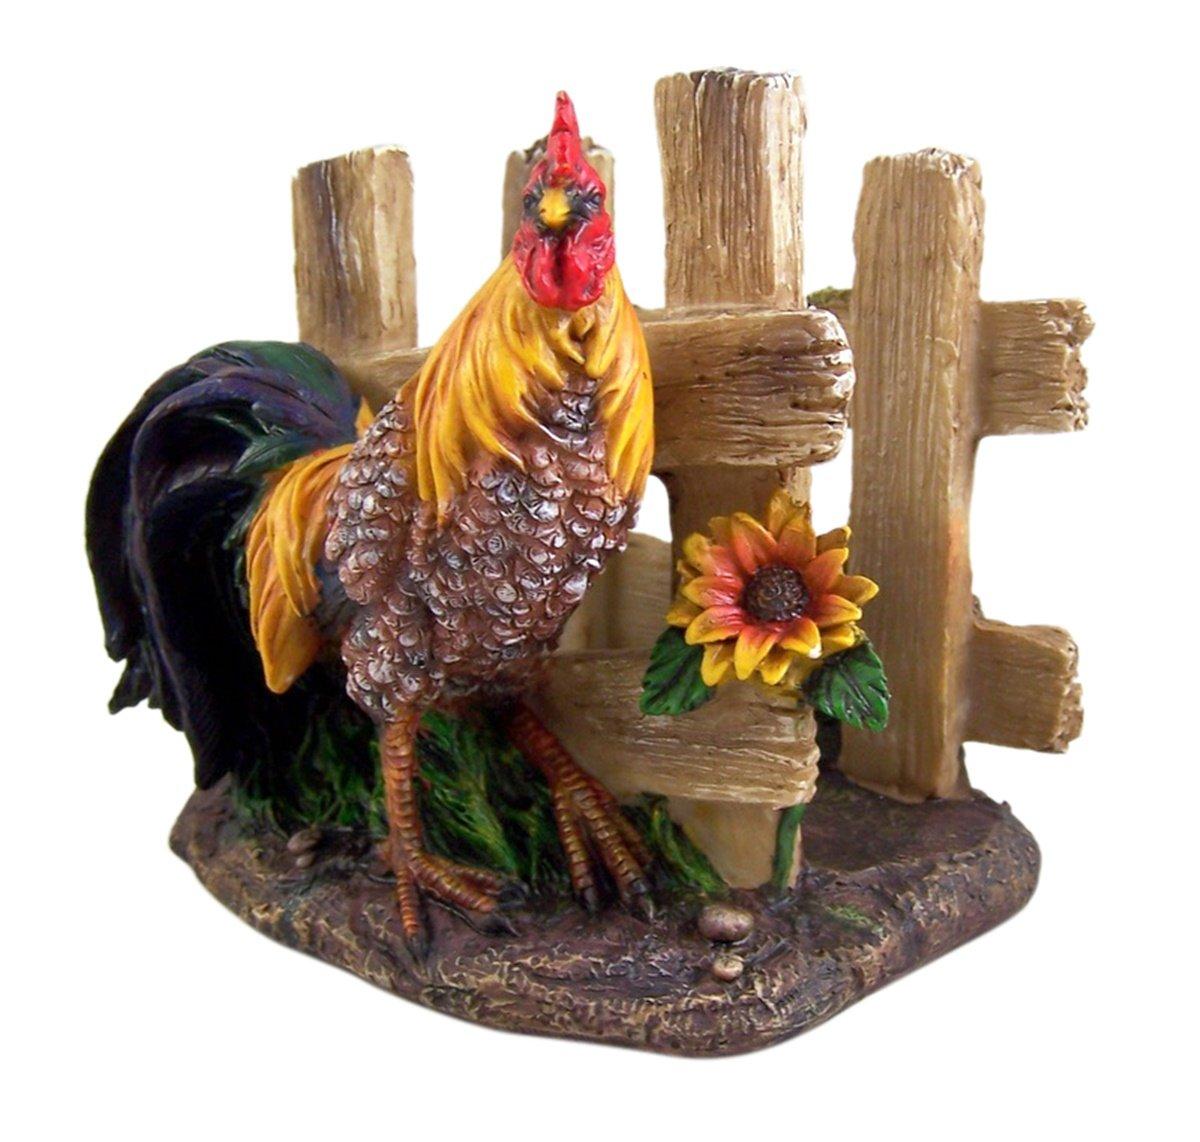 Farm Yard Rooster Napkin Holder 5 1/4 Inch by Decorative Napkin Holder (Image #1)